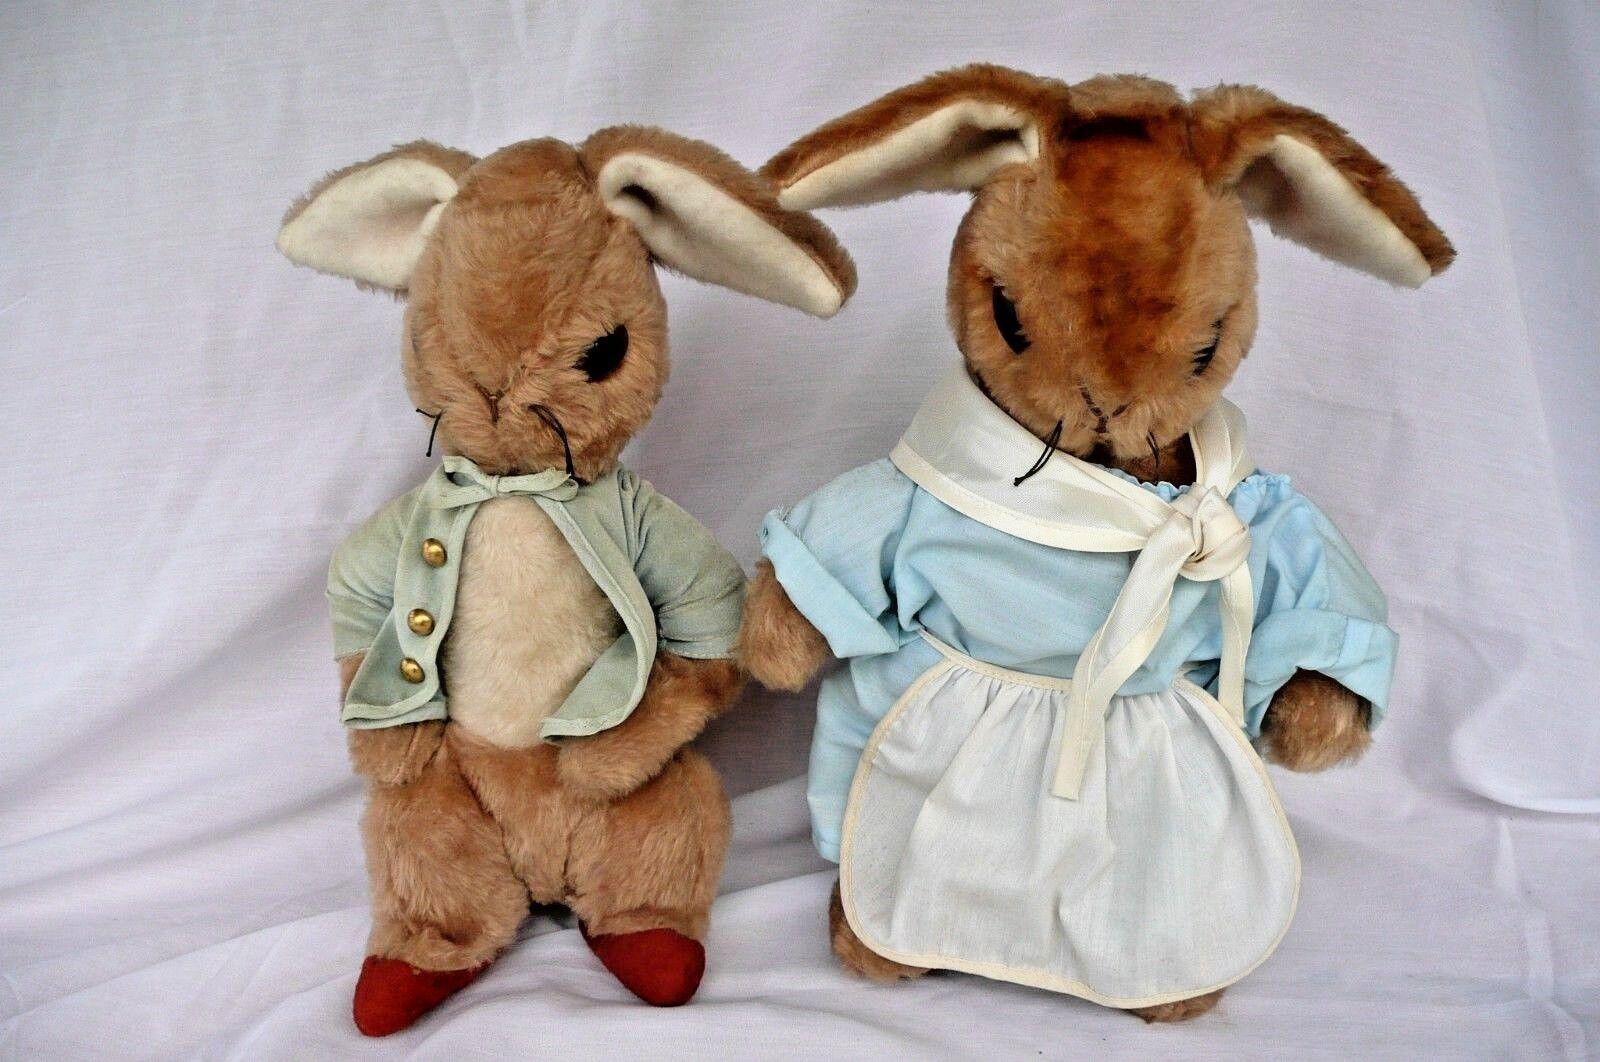 Mrs. Rabbit & Peter Plush Beatrix Potter Eden Toy Co. 1970s Vintage RARE HTF